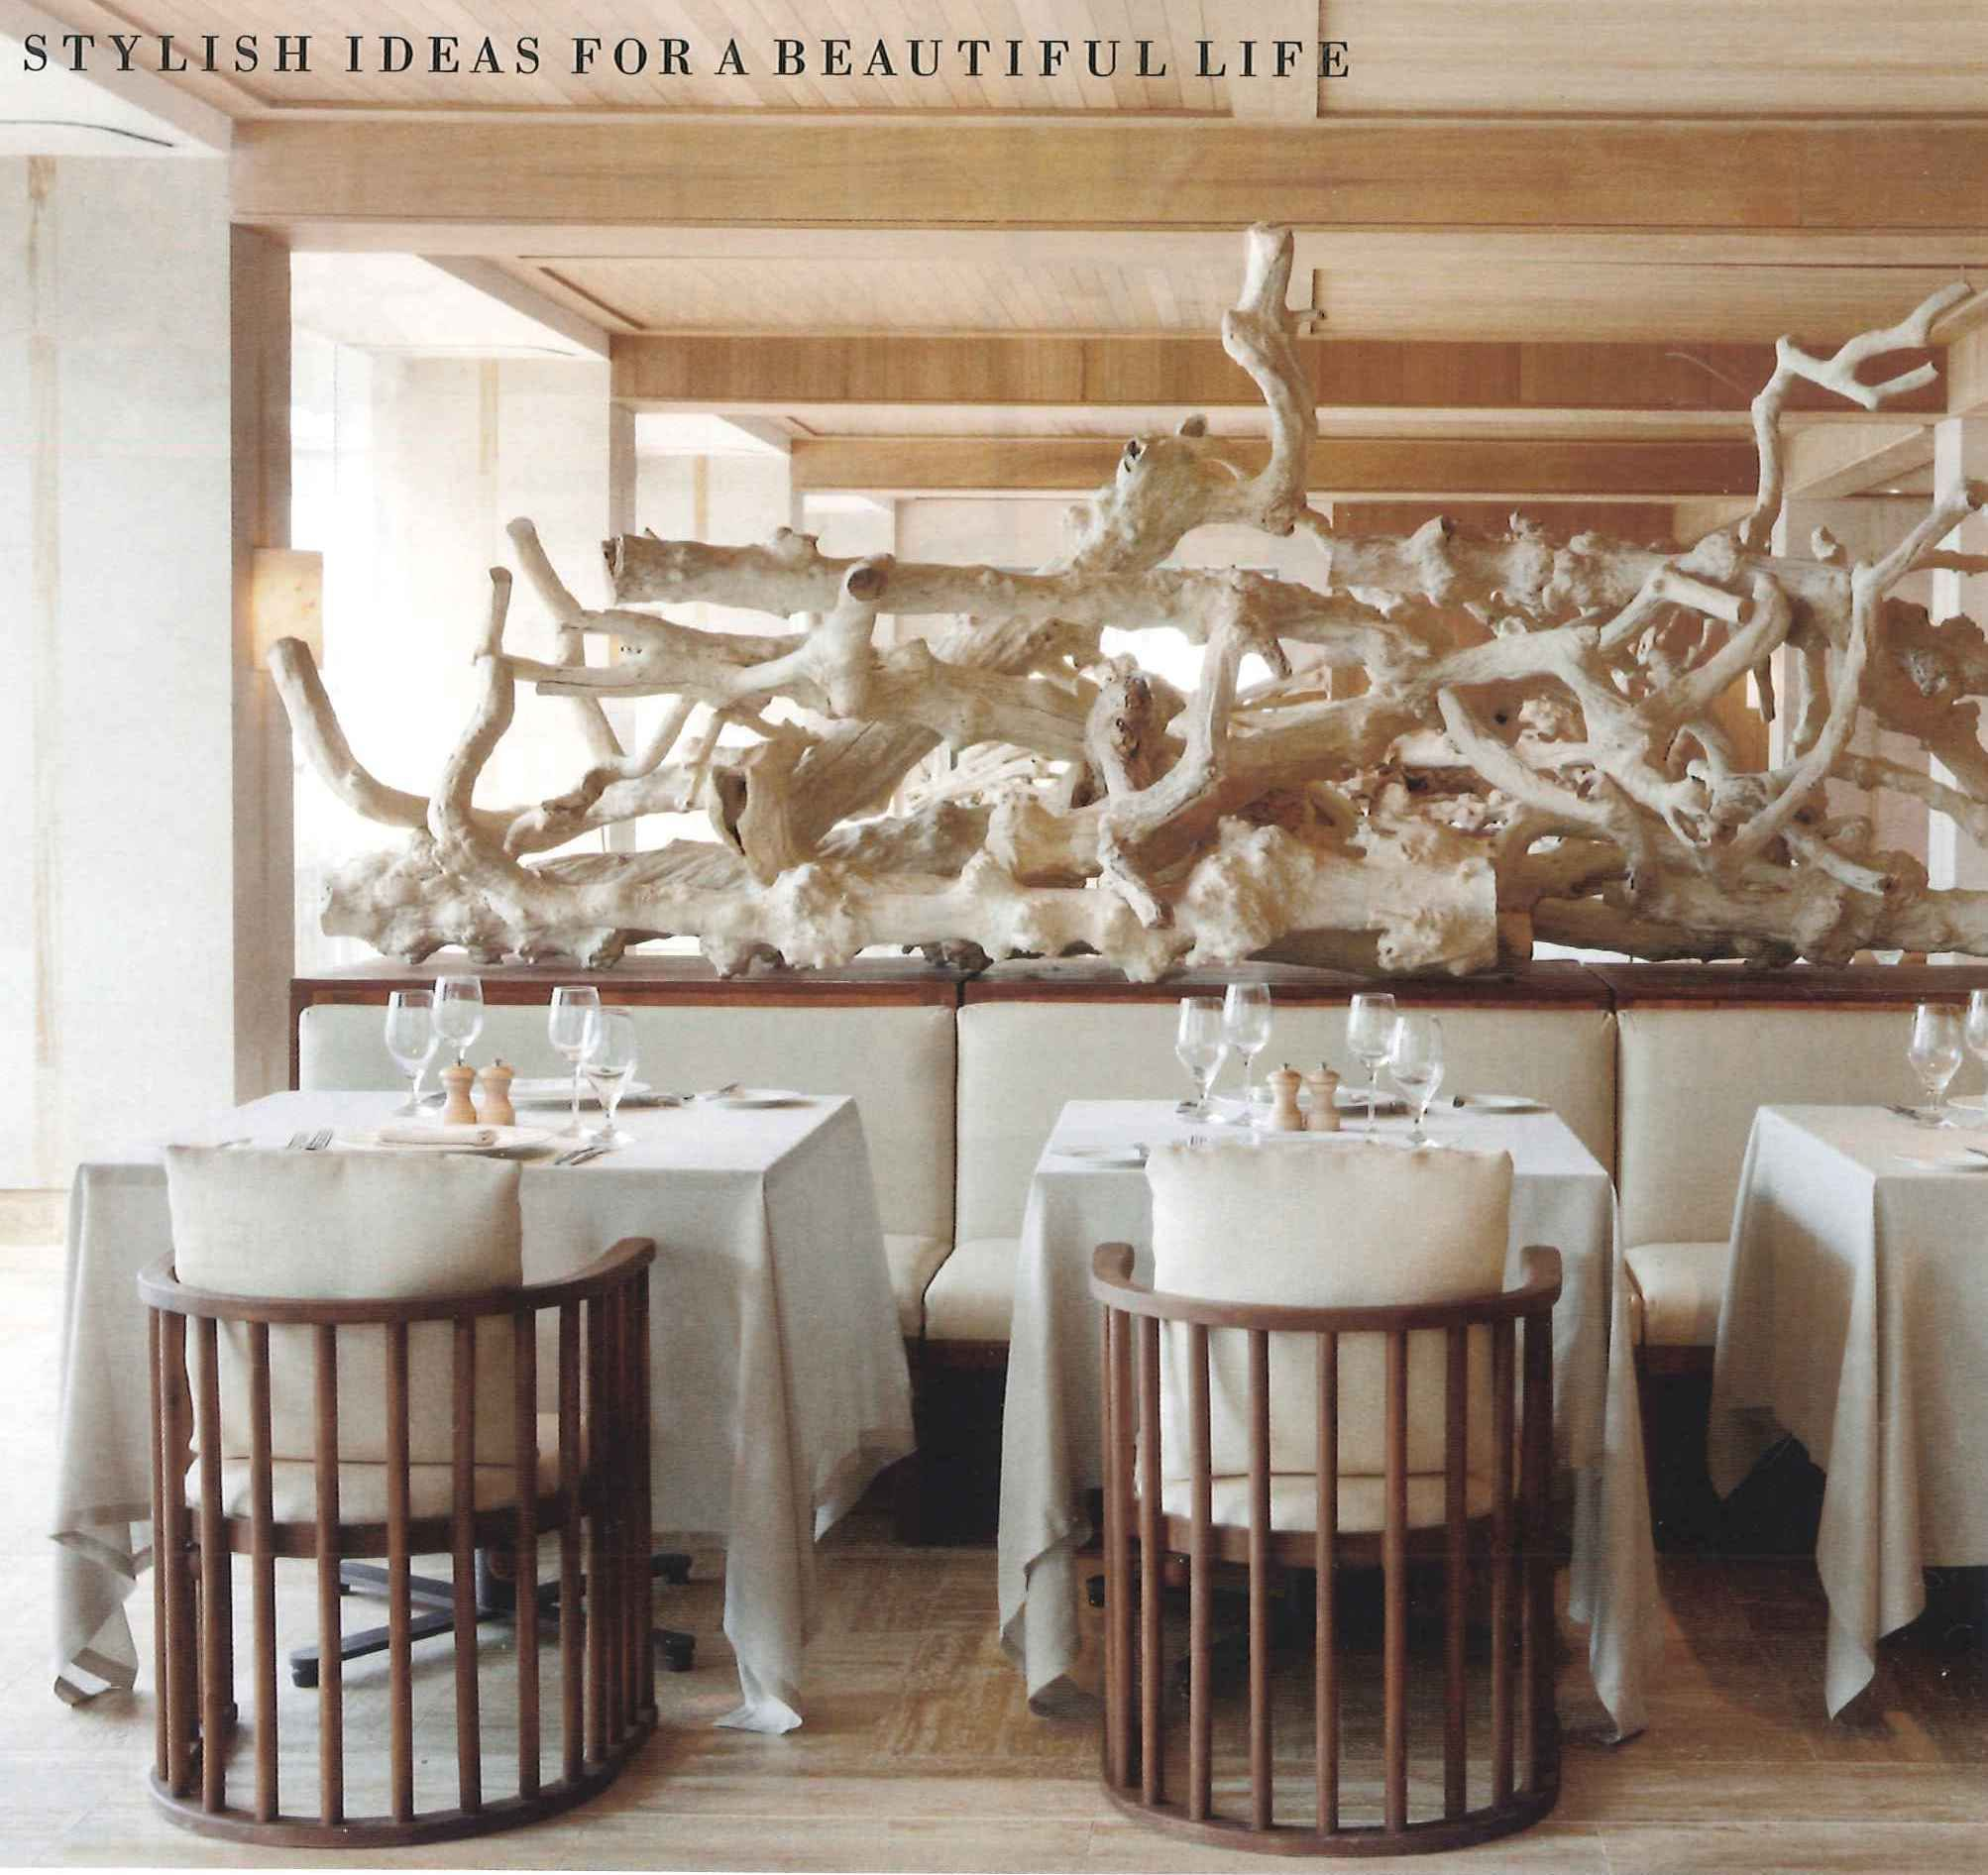 Artistic driftwood display resort interior kelly wearstler hospitality design elle decor porches